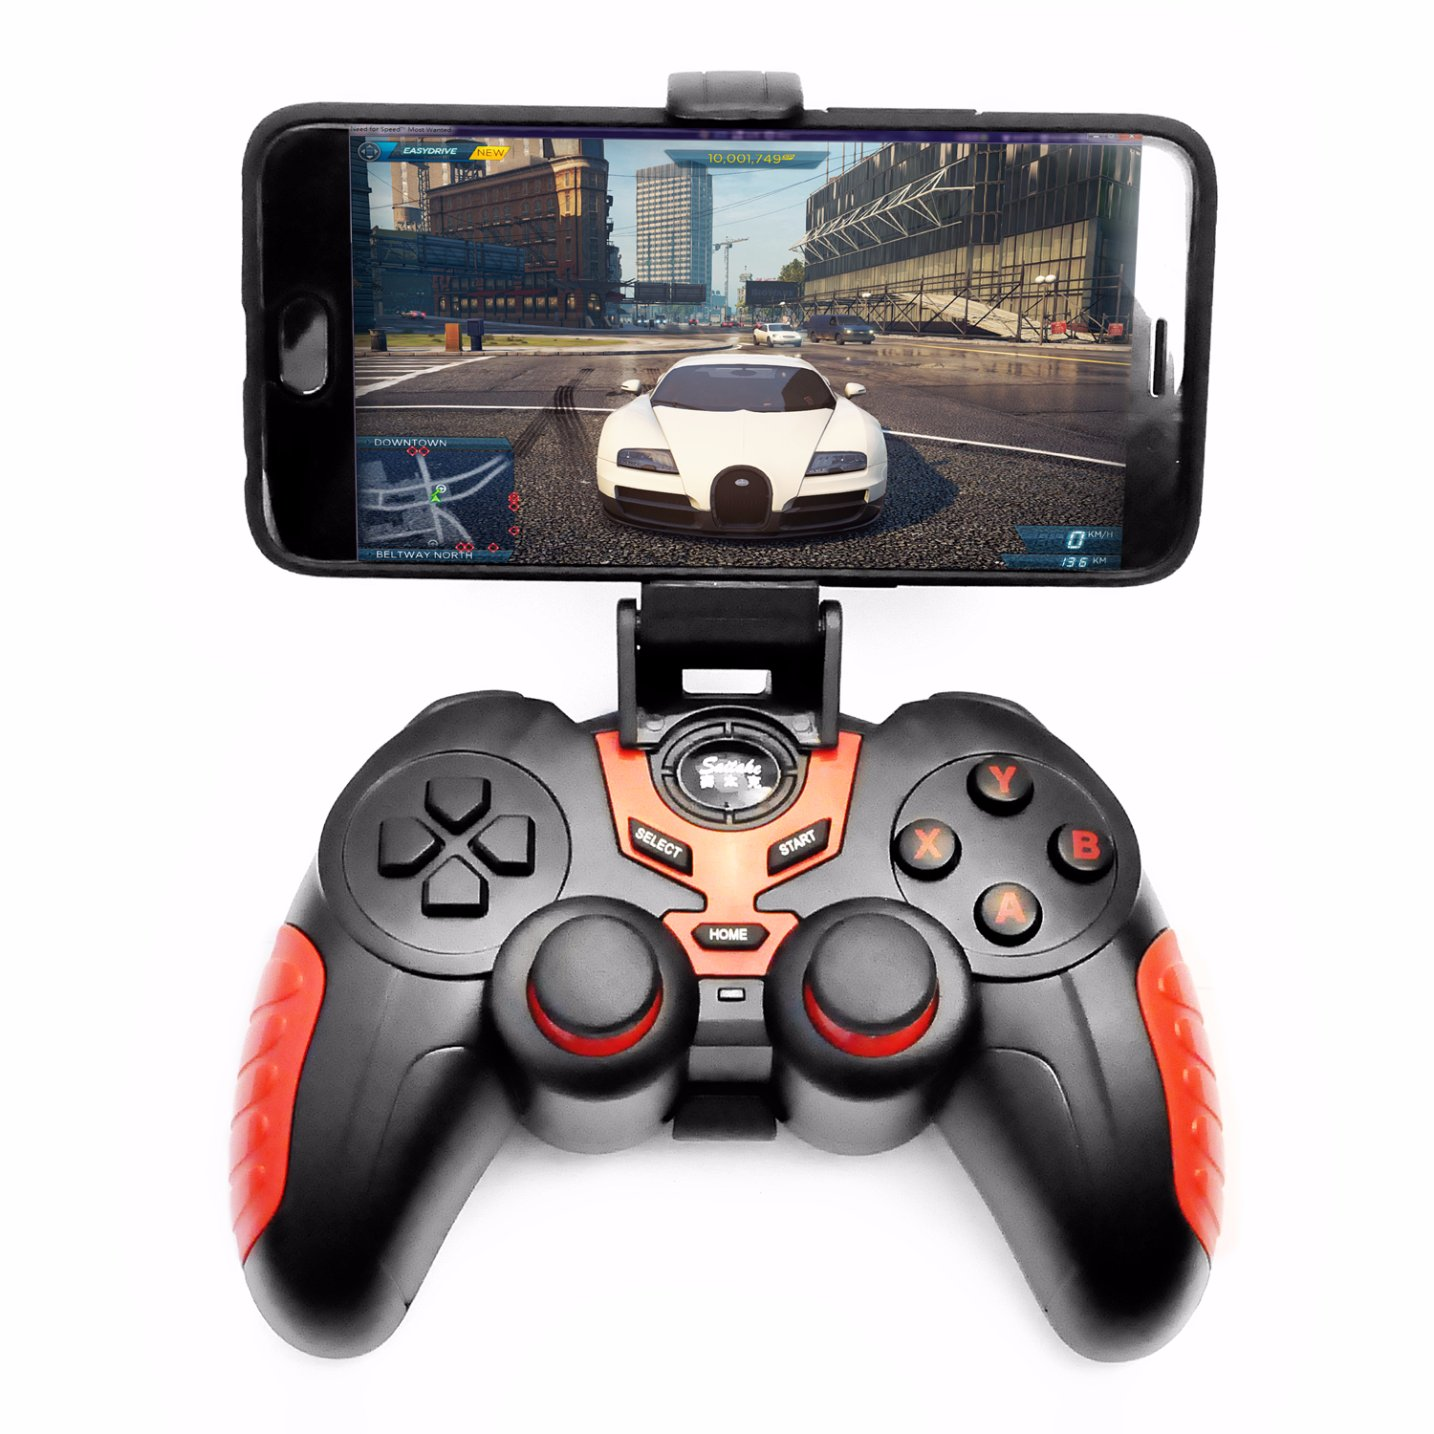 STK-7024X Bluetooth Game Controller